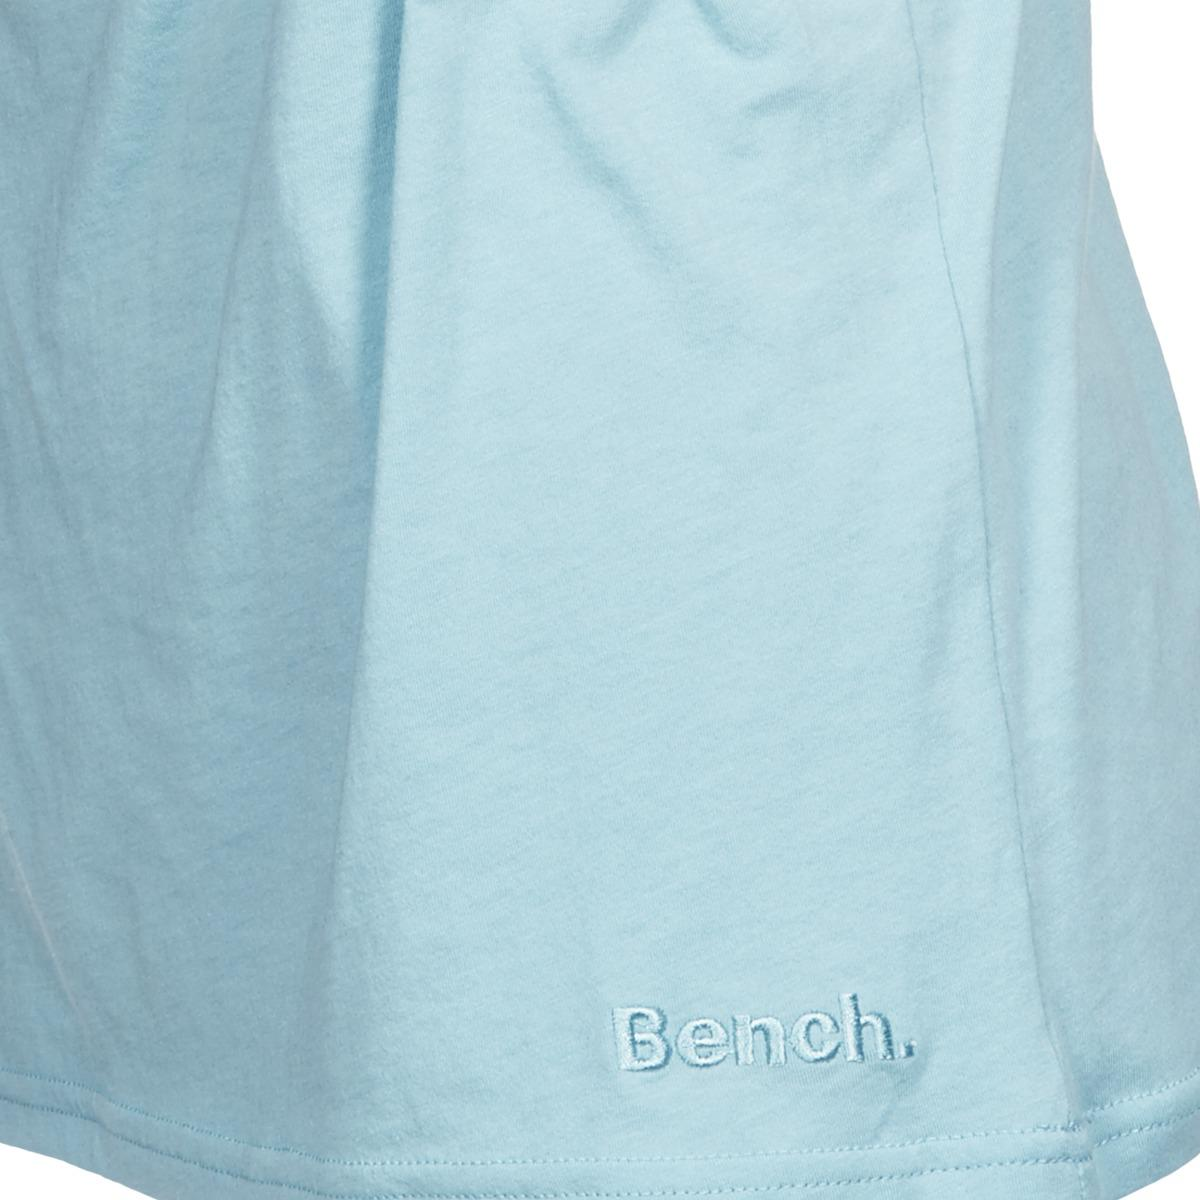 Bench Skinnie Women's Vest Top In Blue